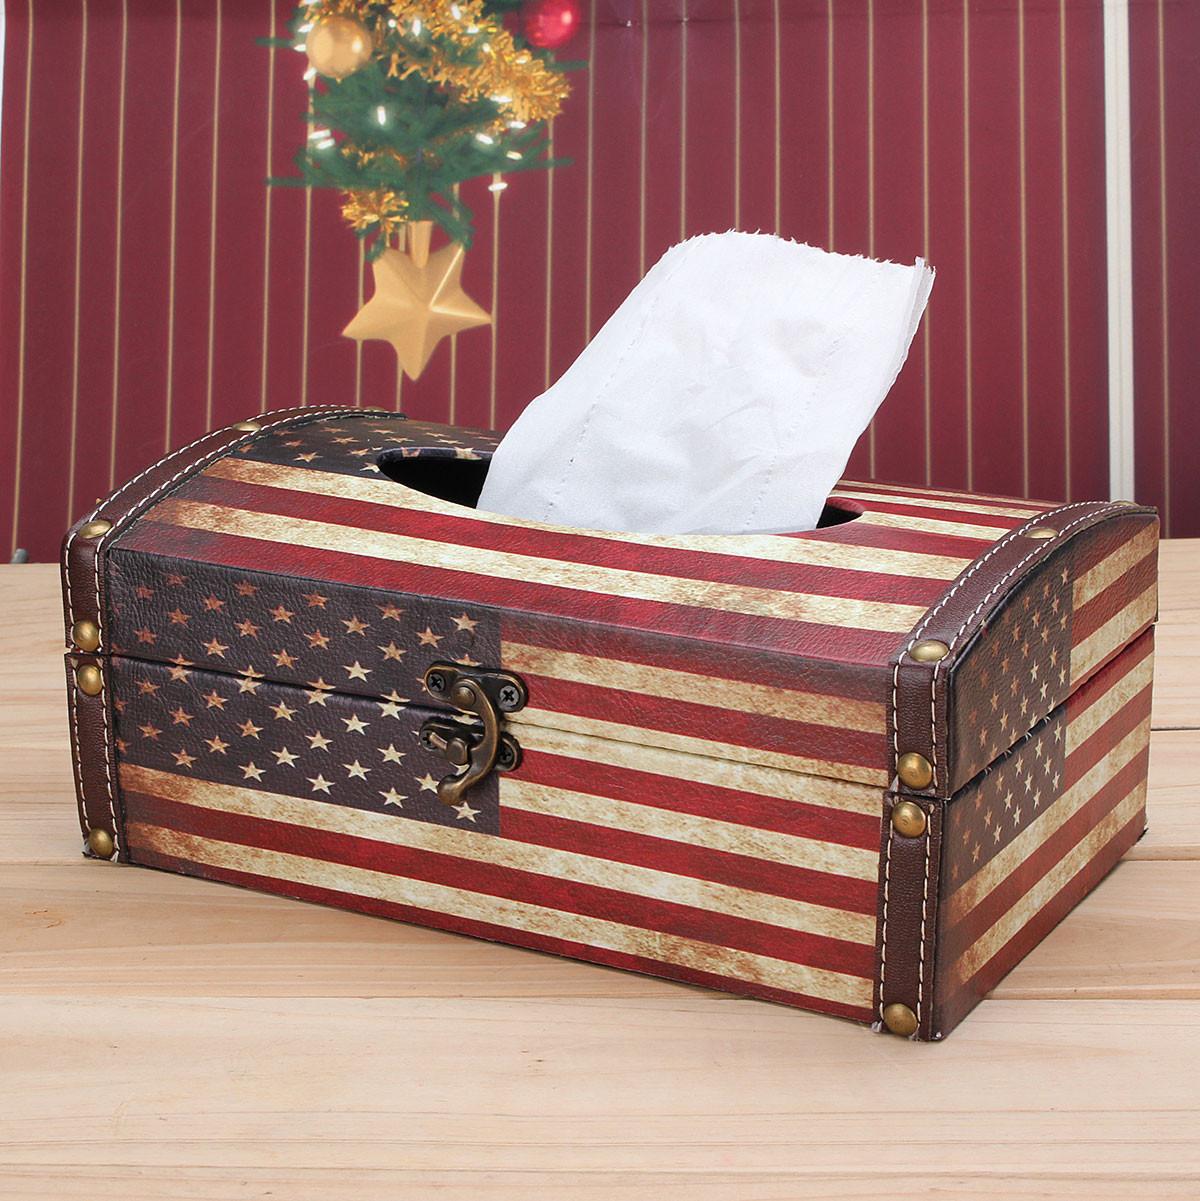 R tro drapeau uk us rectangle pu cuir bo te mouchoirs tissu papier maison d co ebay - Boite a mouchoirs maison ...